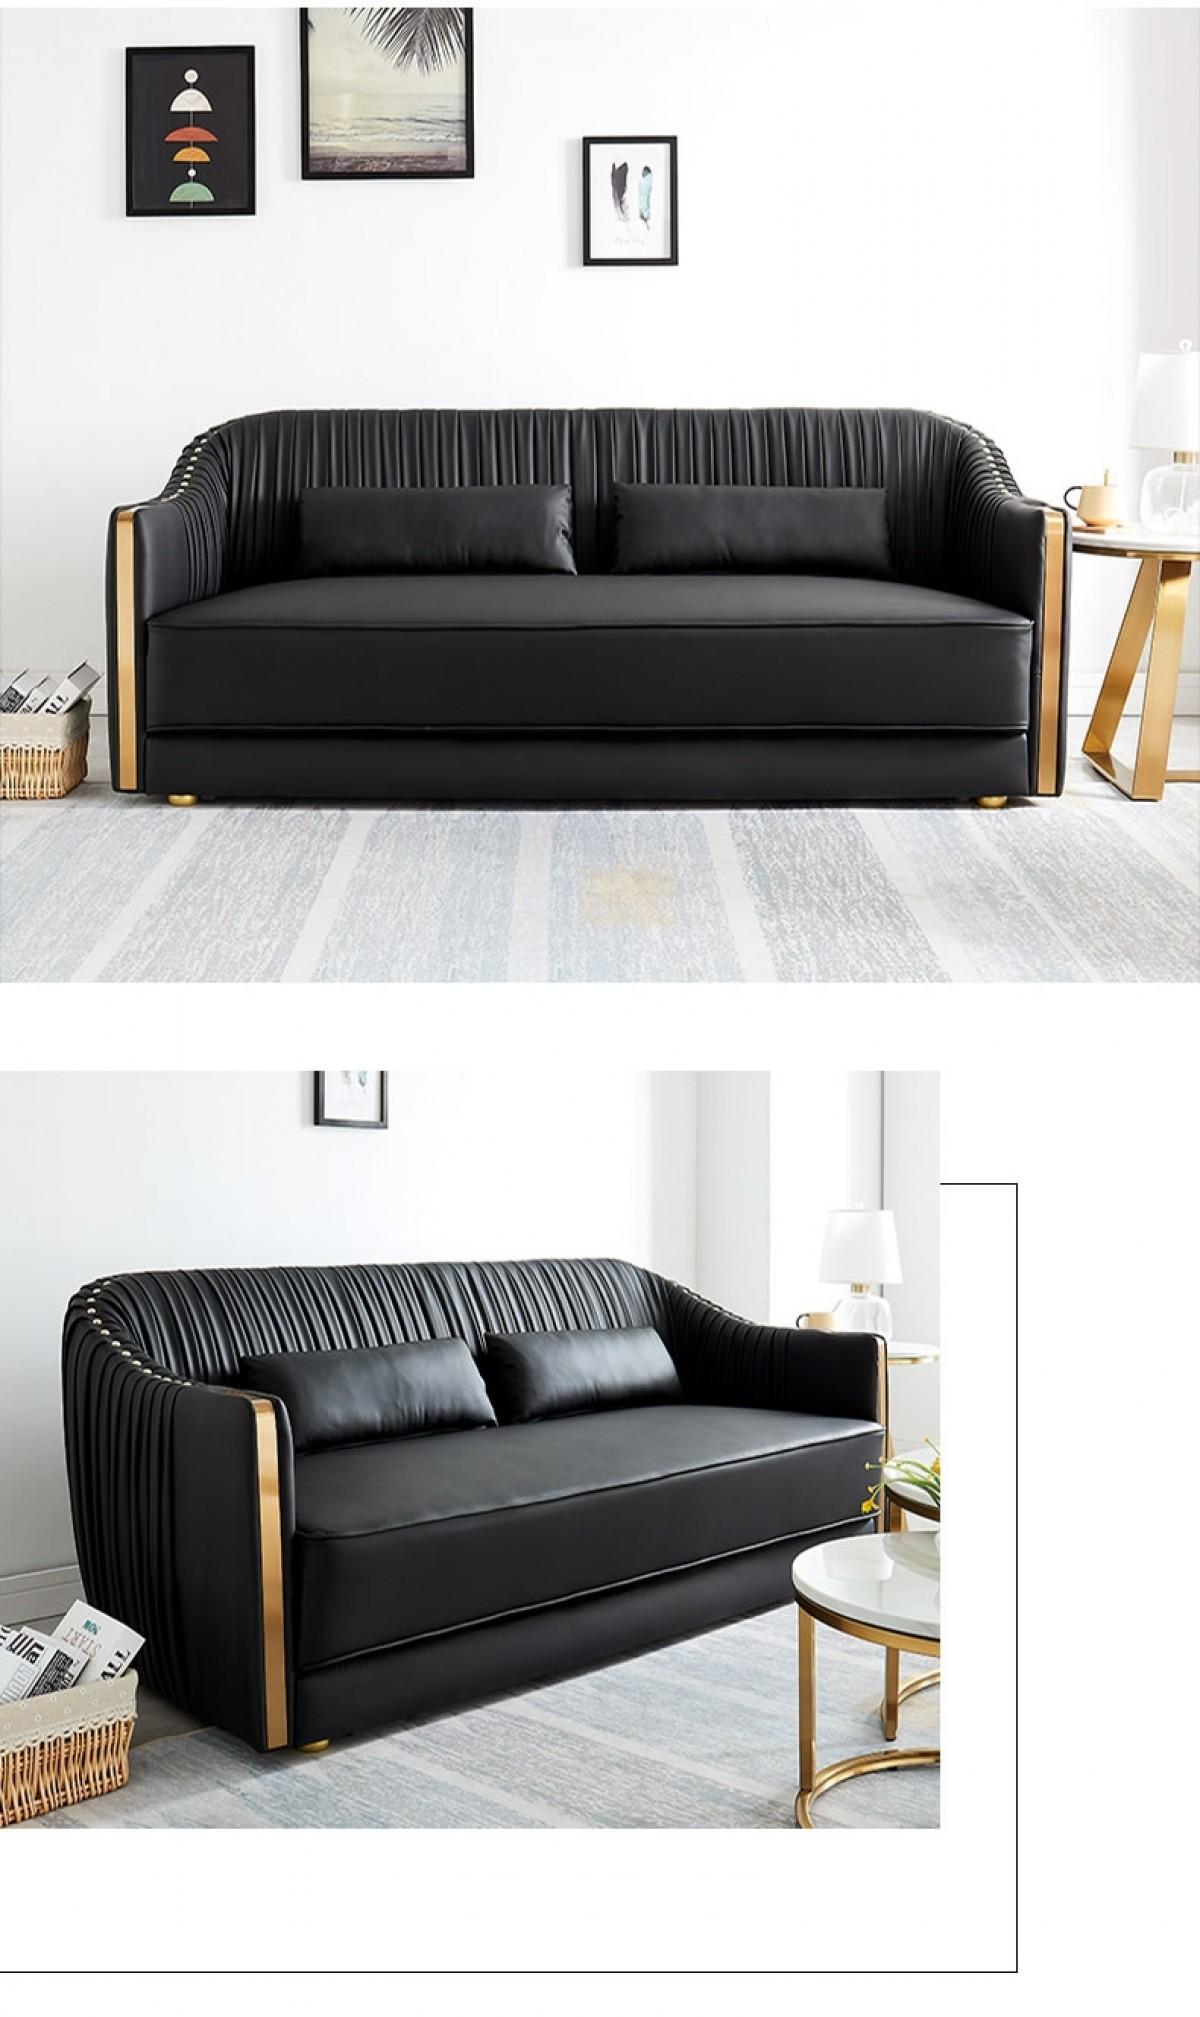 luxury living room modern sofa chesterfield nightclub ...